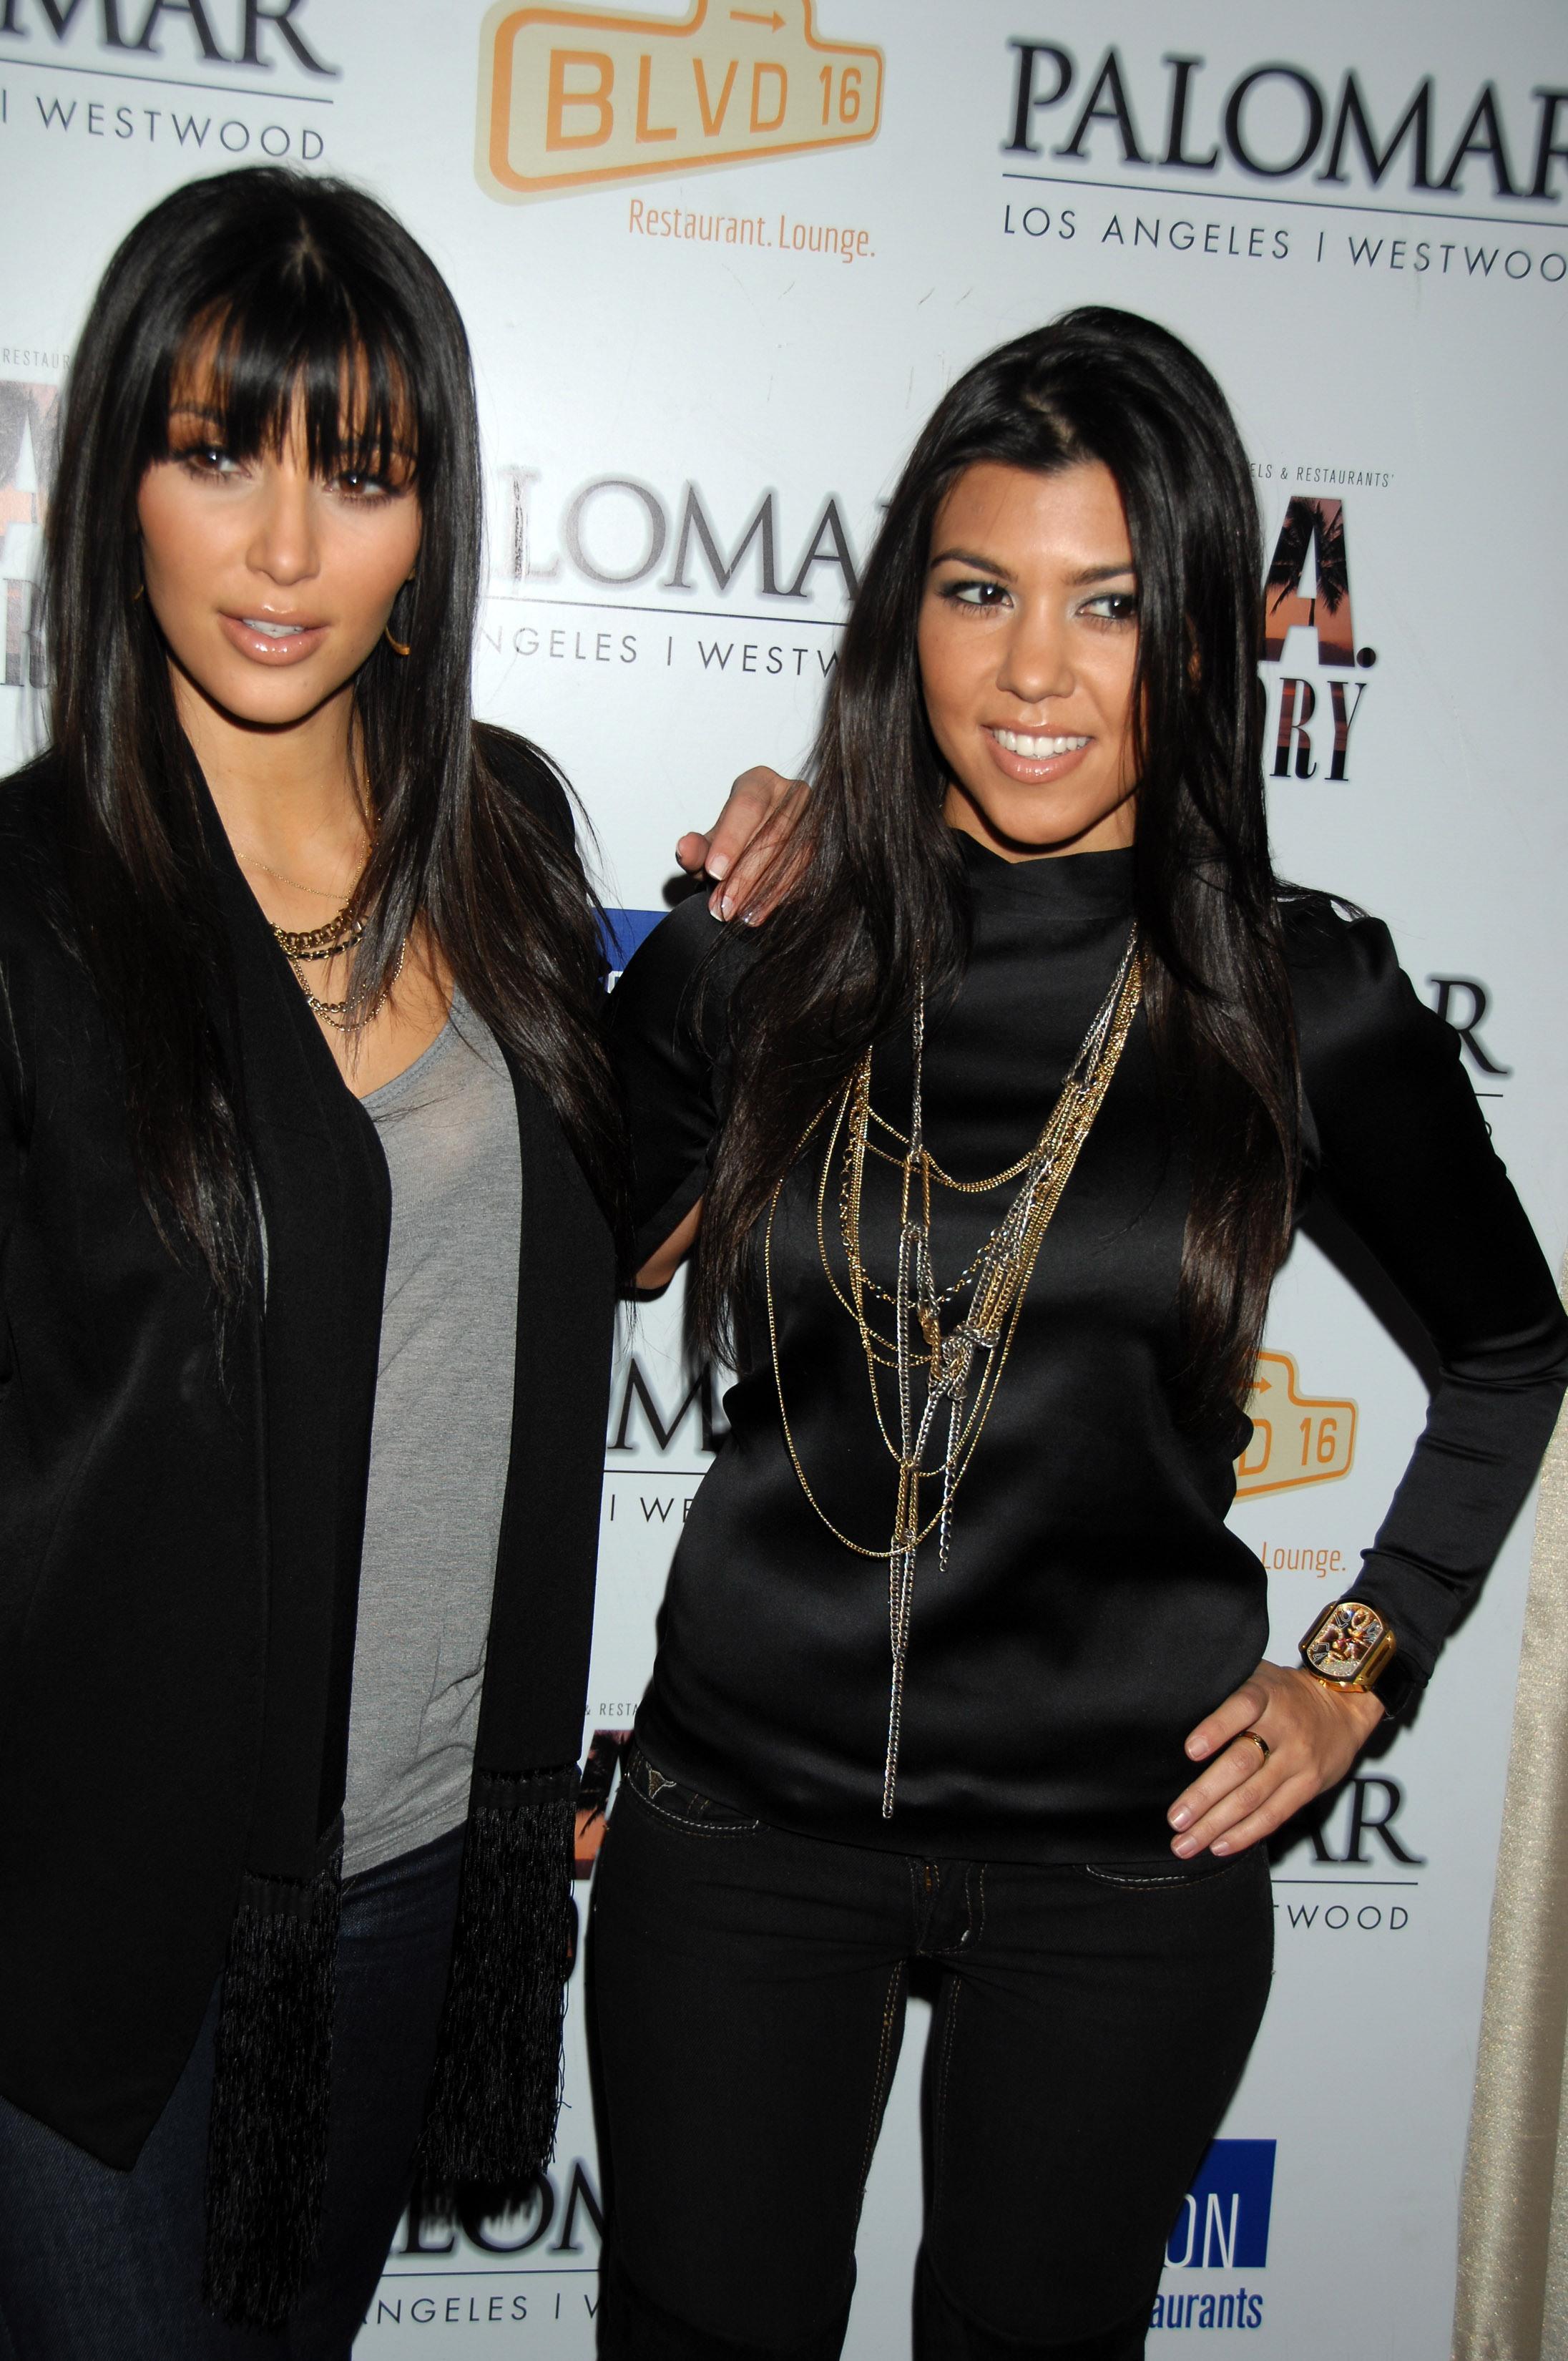 03271_Kim_Kardashian_2008-12-08_-_A_Night_For_Change_benefiting_Alternative_Intervention_Models_in_LA_122_1075lo.jpg